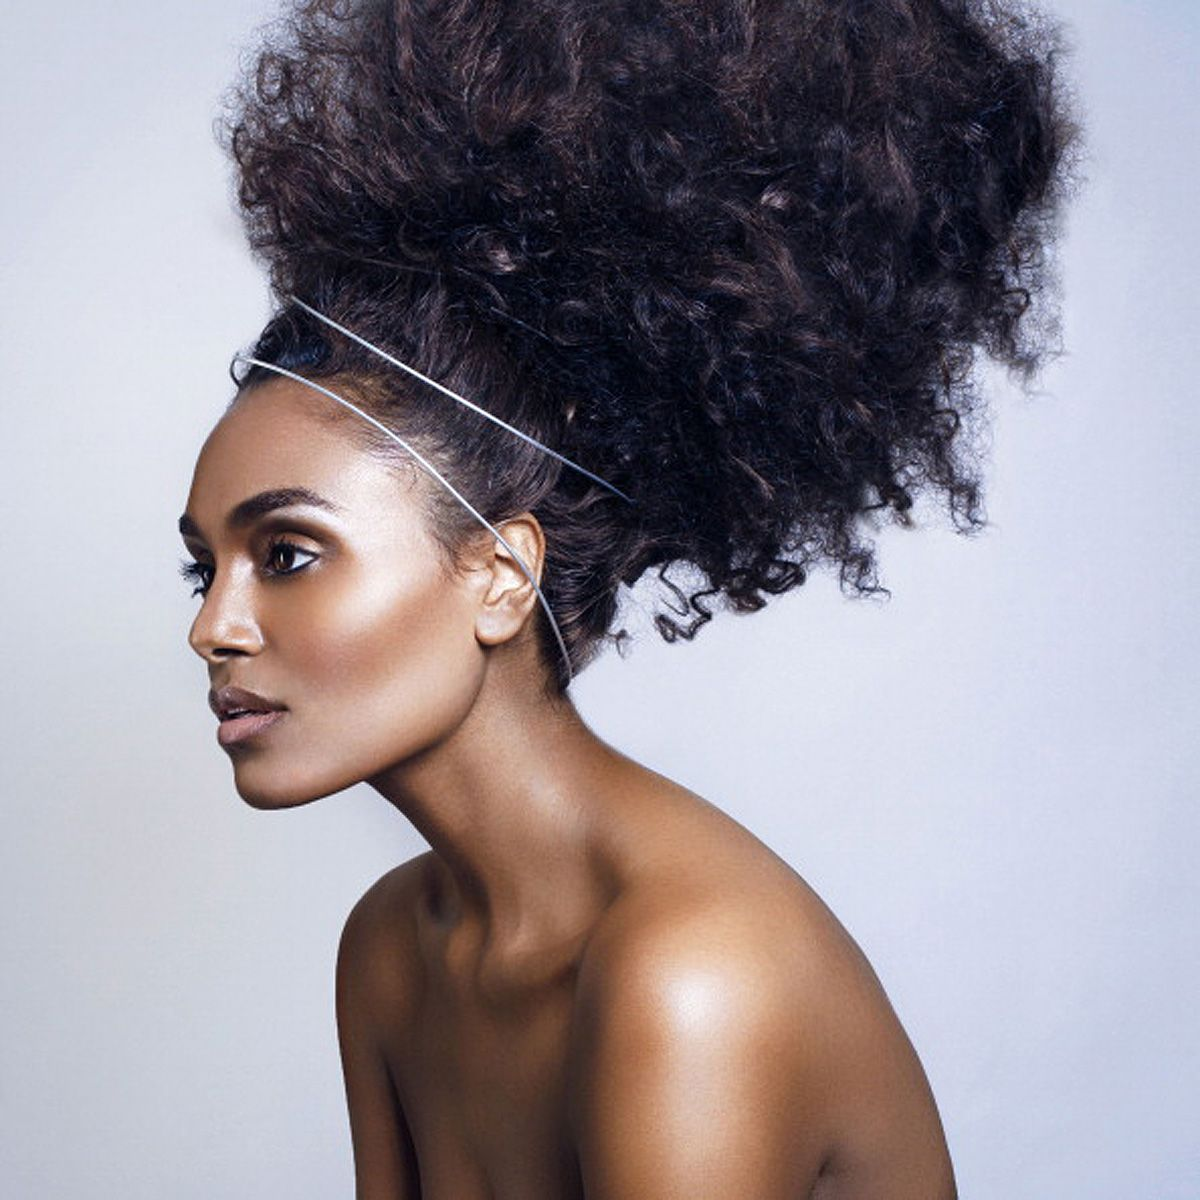 black female in creative hair art